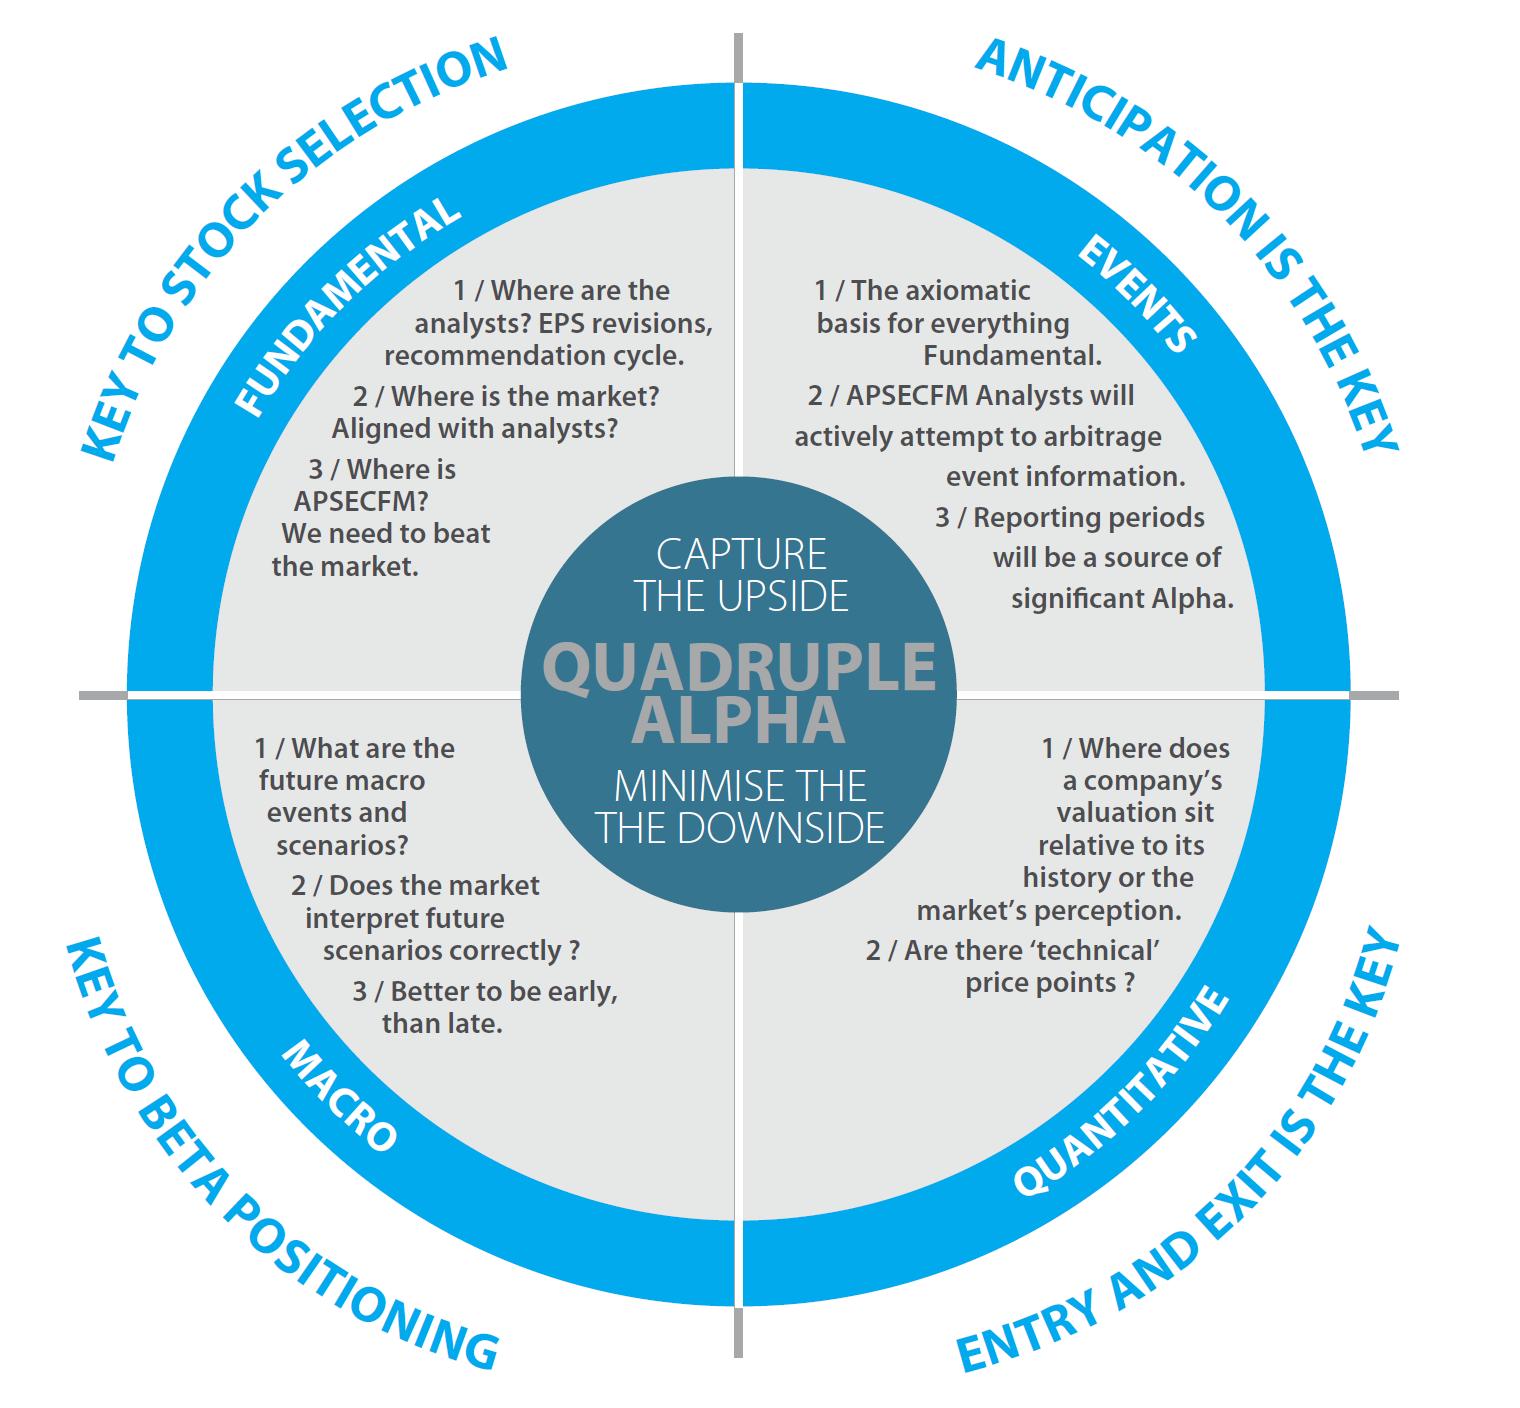 Quadruple Alpha Model